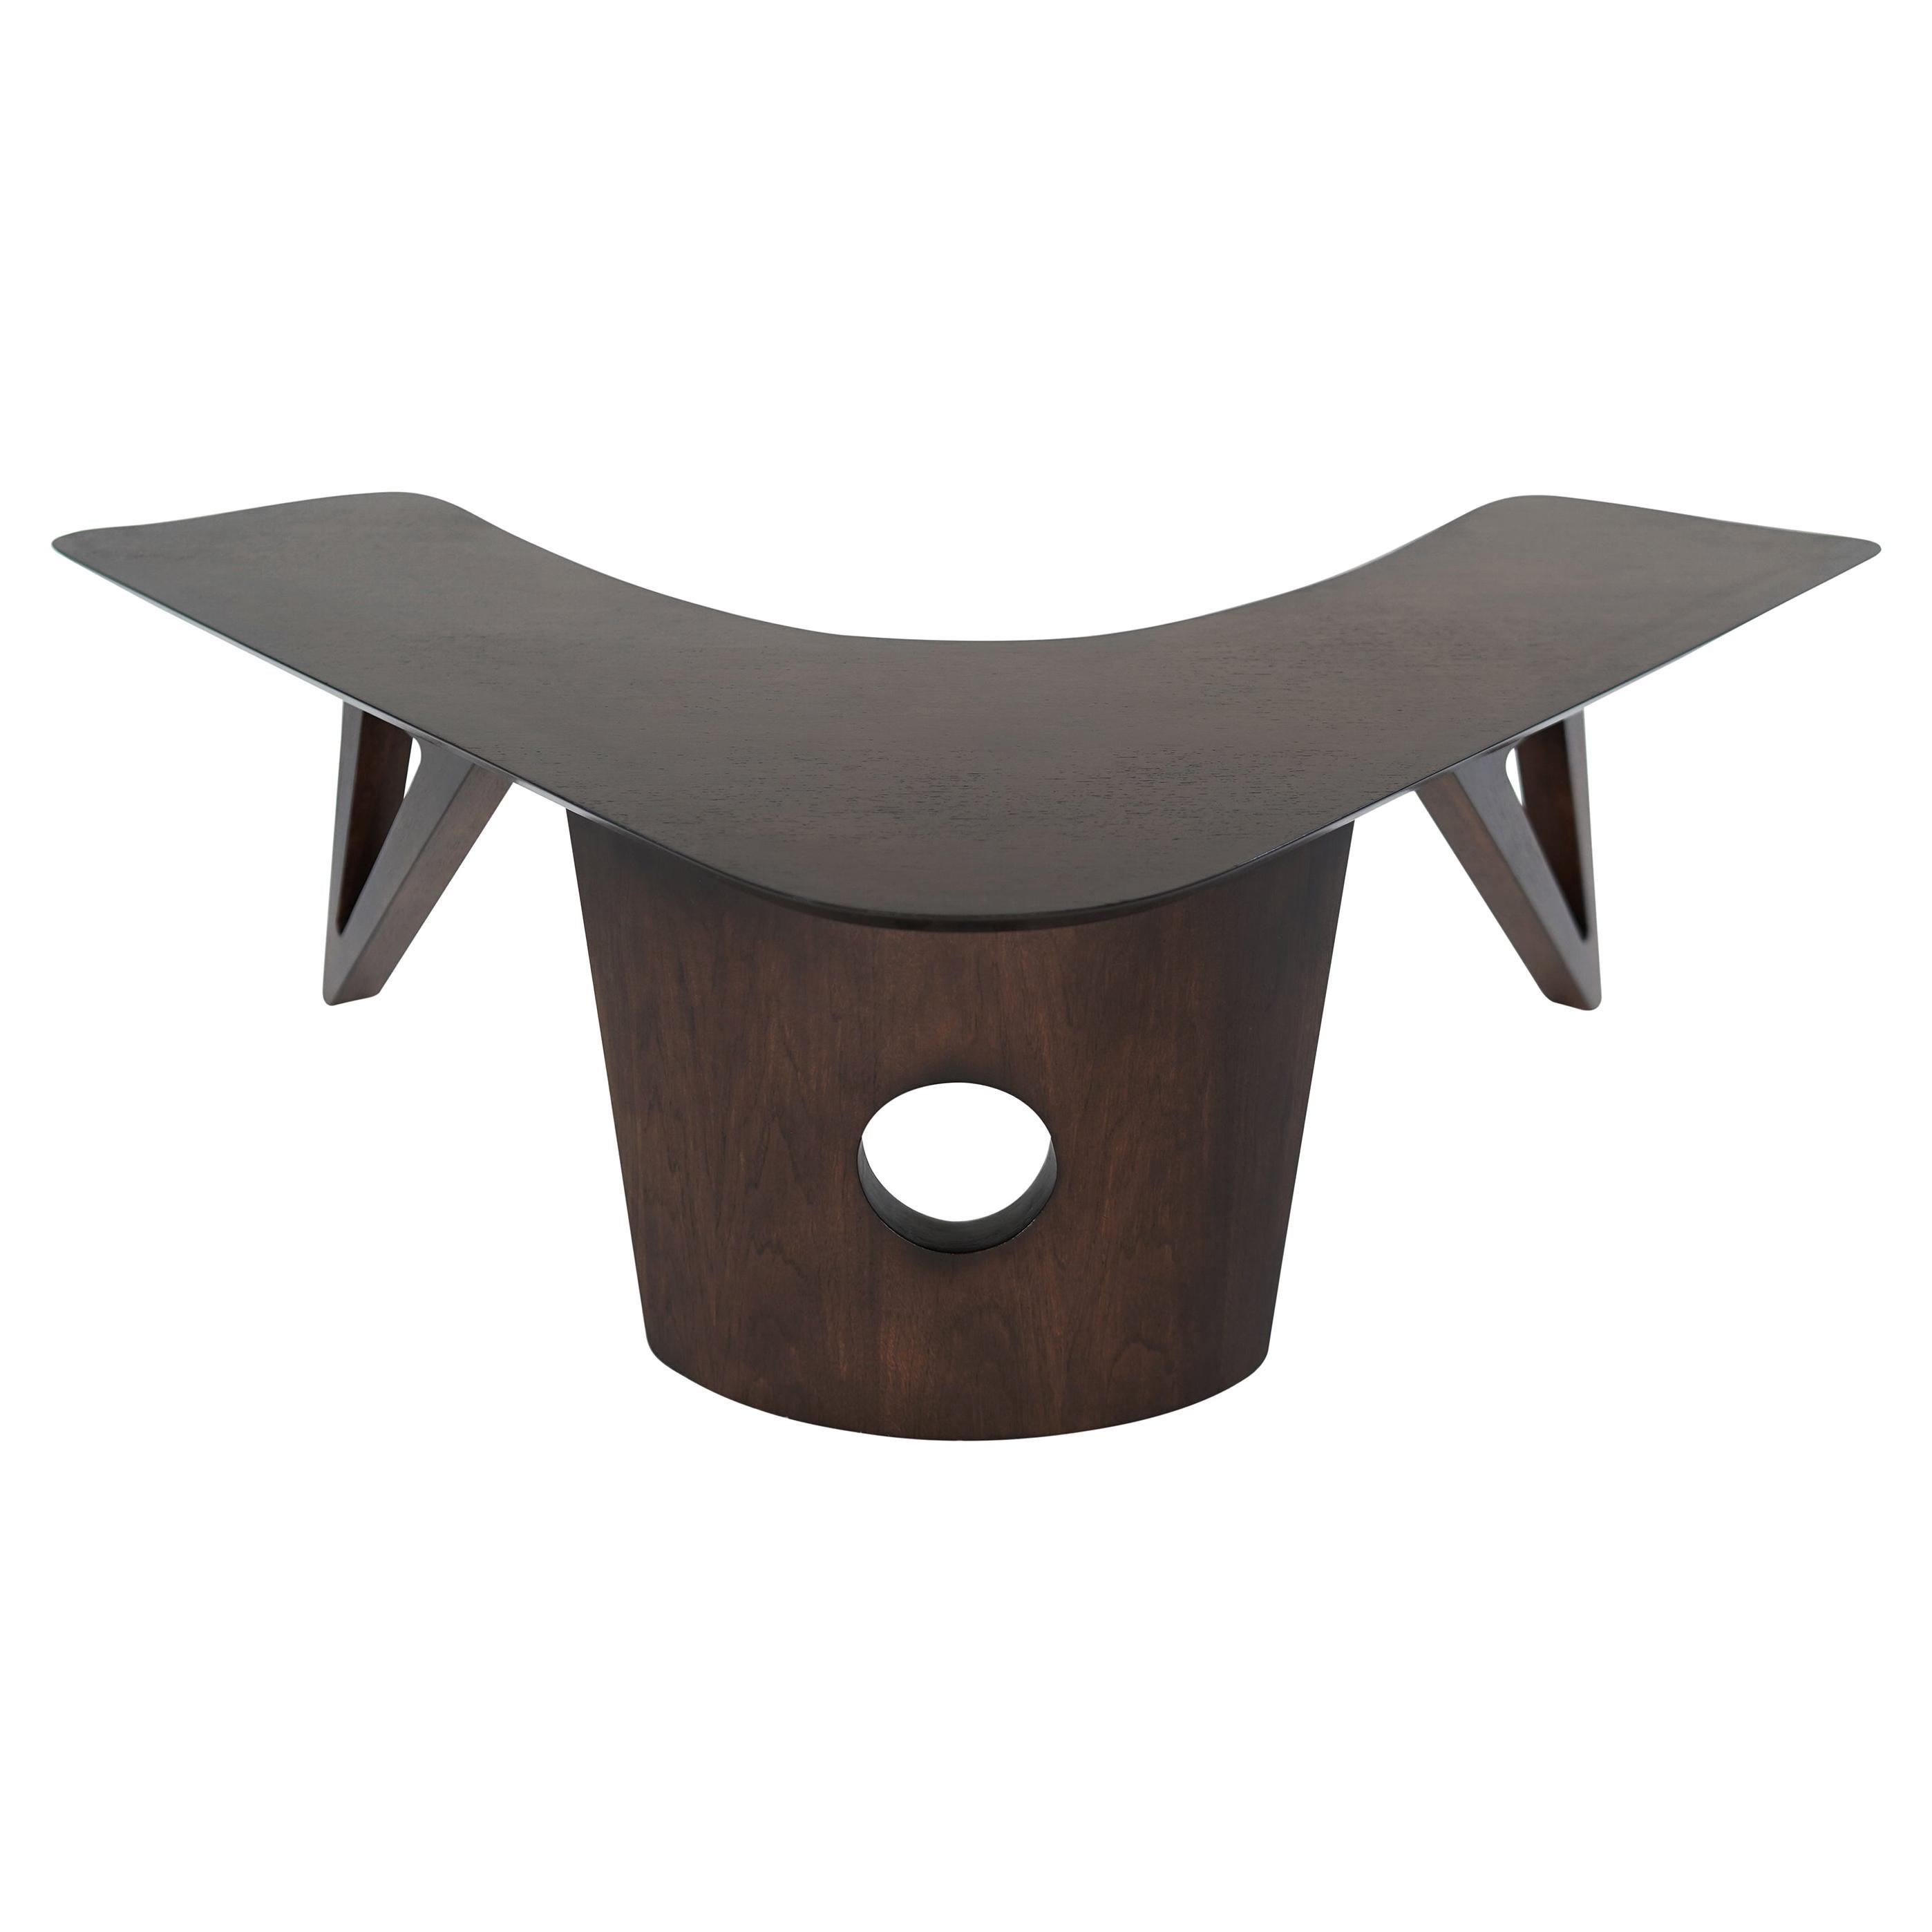 Sculptural Walnut Boomerang Coffee Table, 1950s